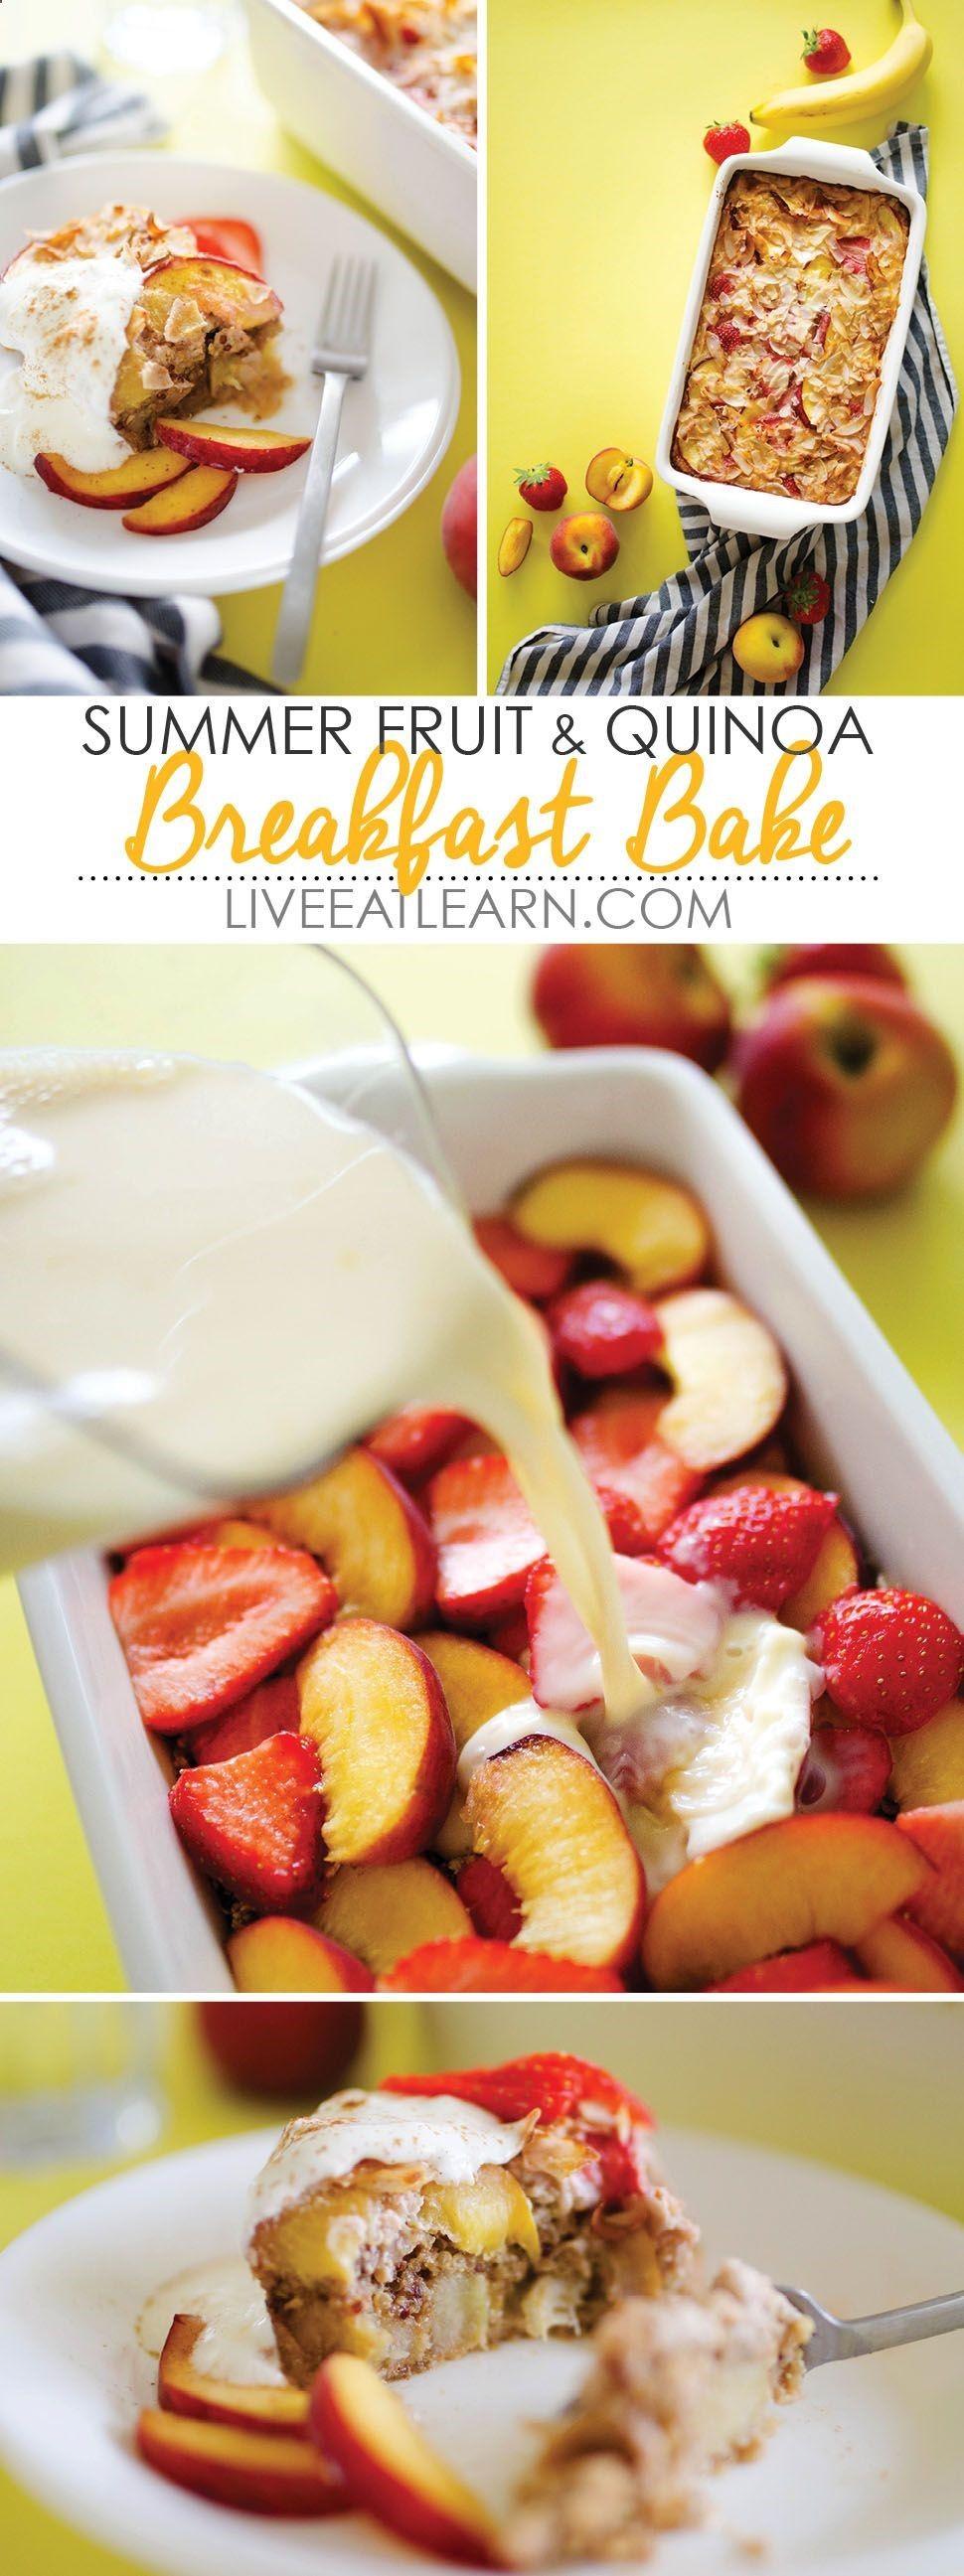 Diet Fast  2 Week Diet  This Summer Fruit